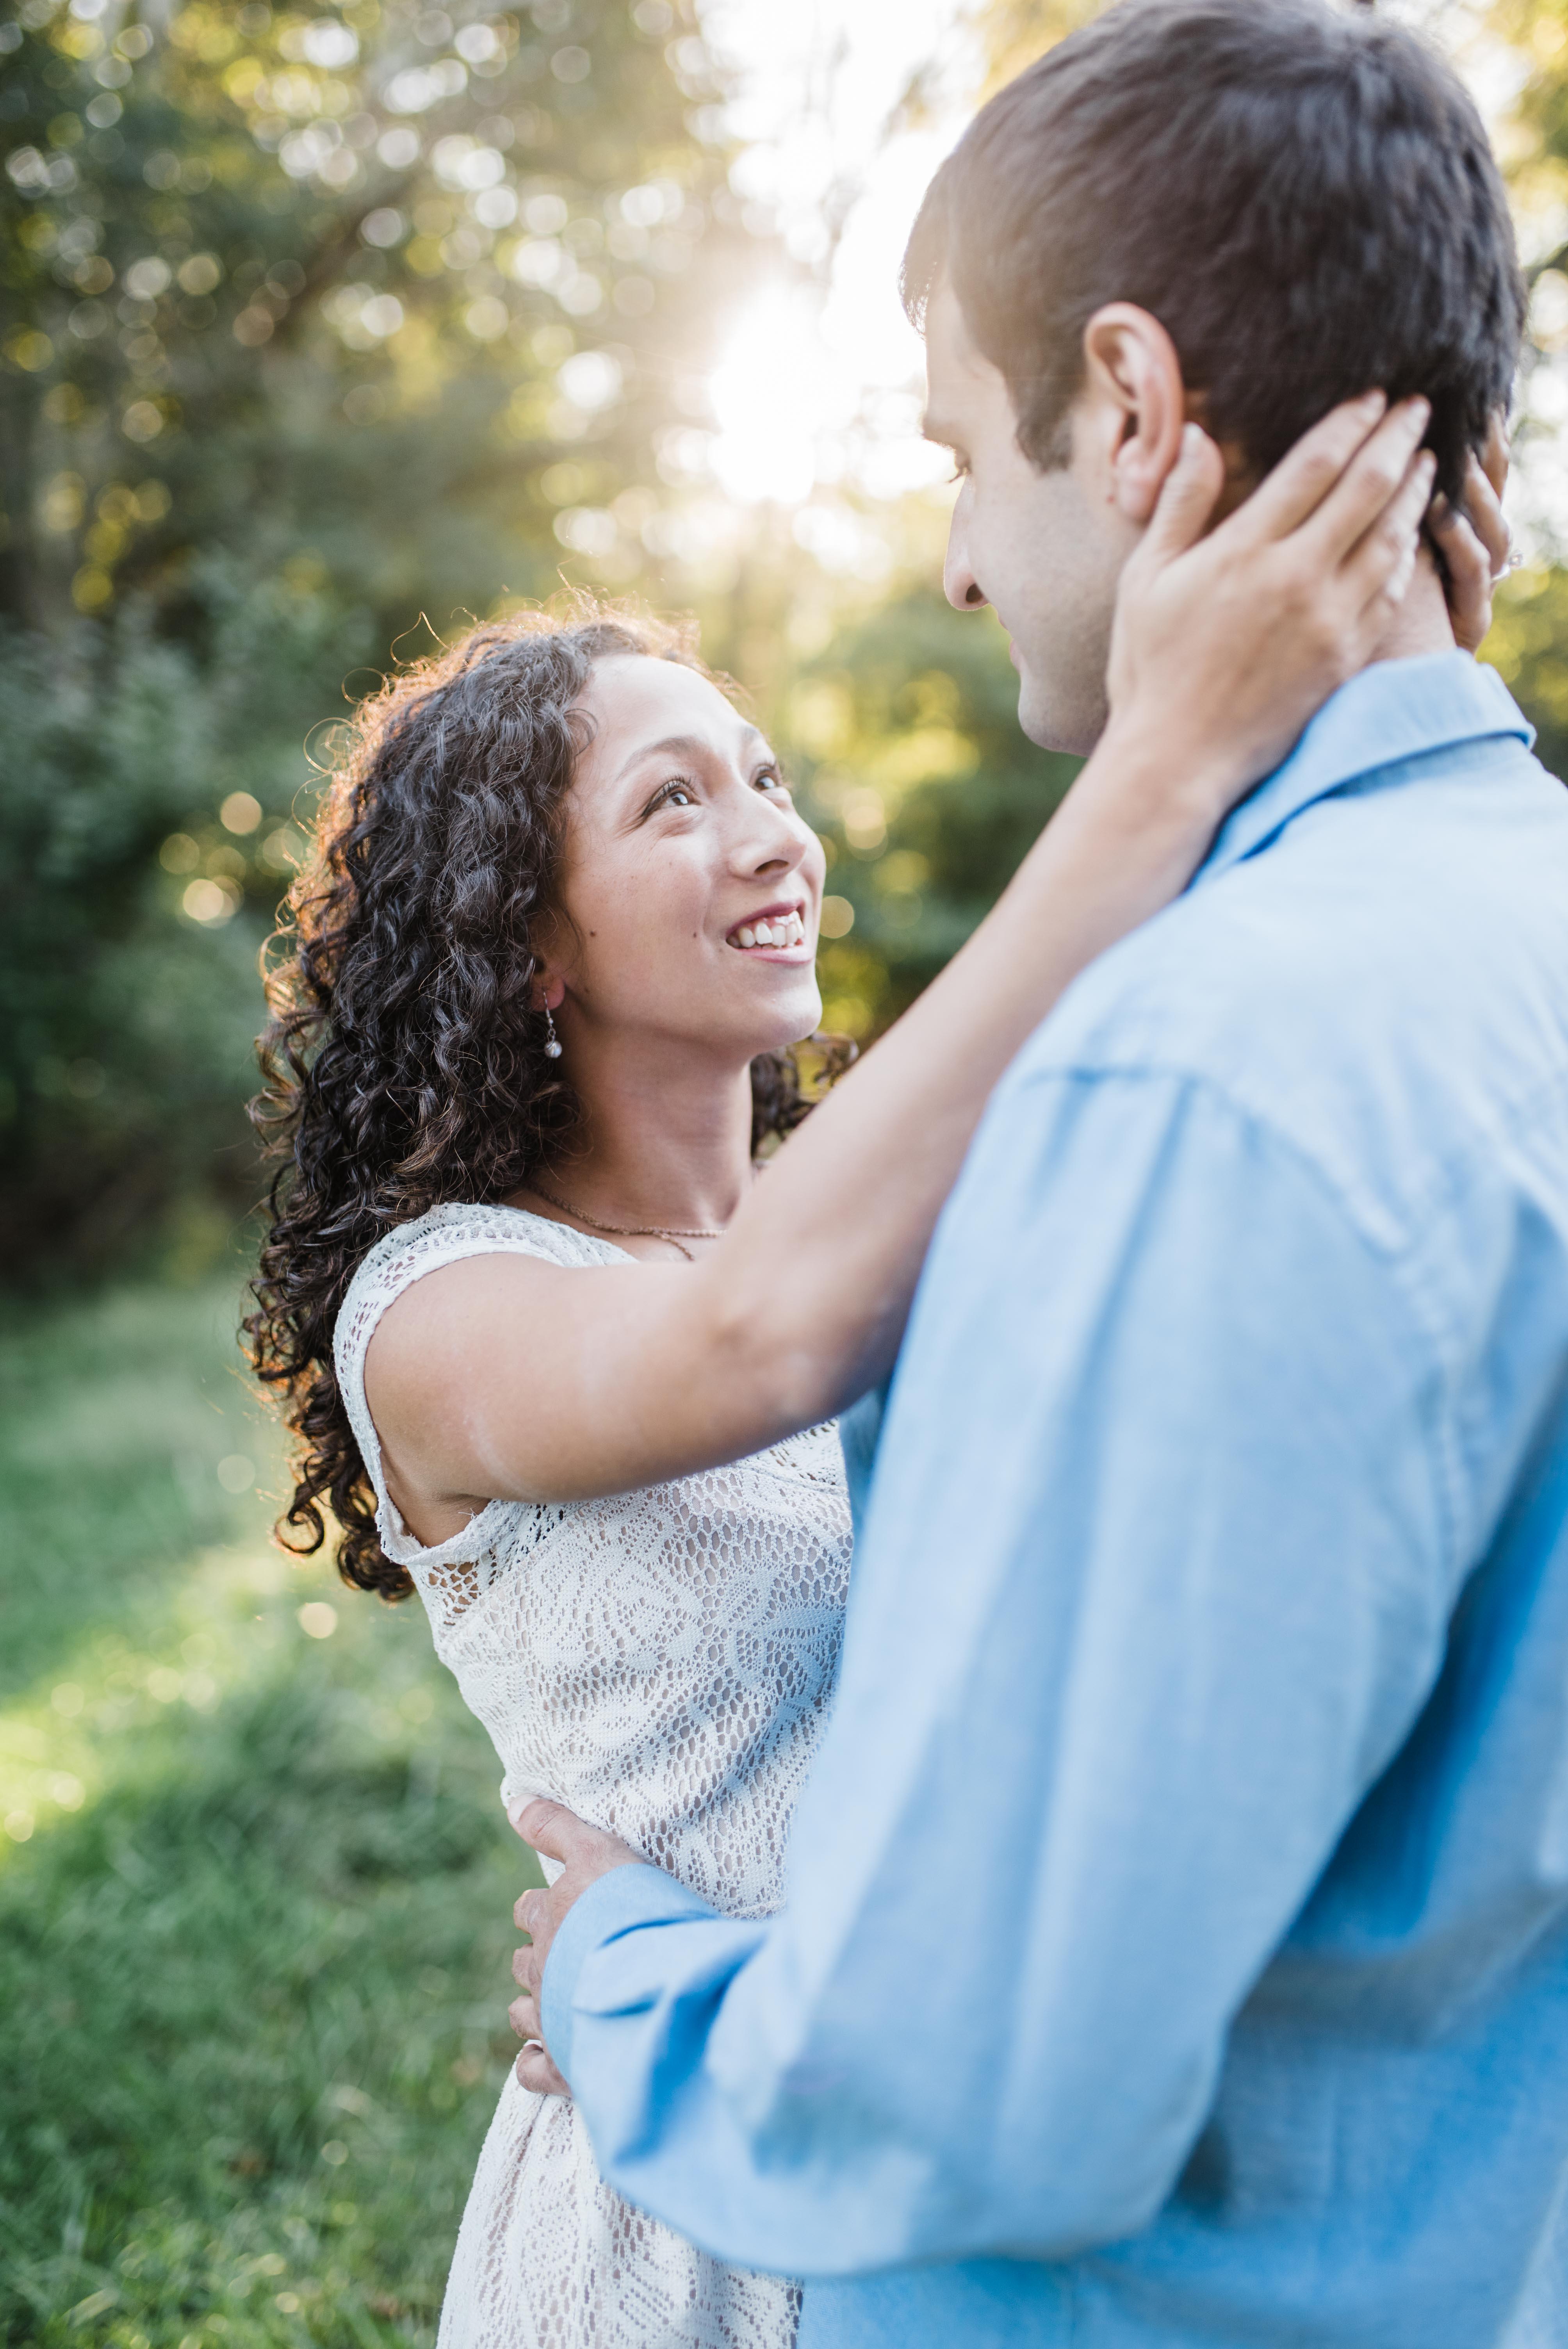 dating a widowed man advice